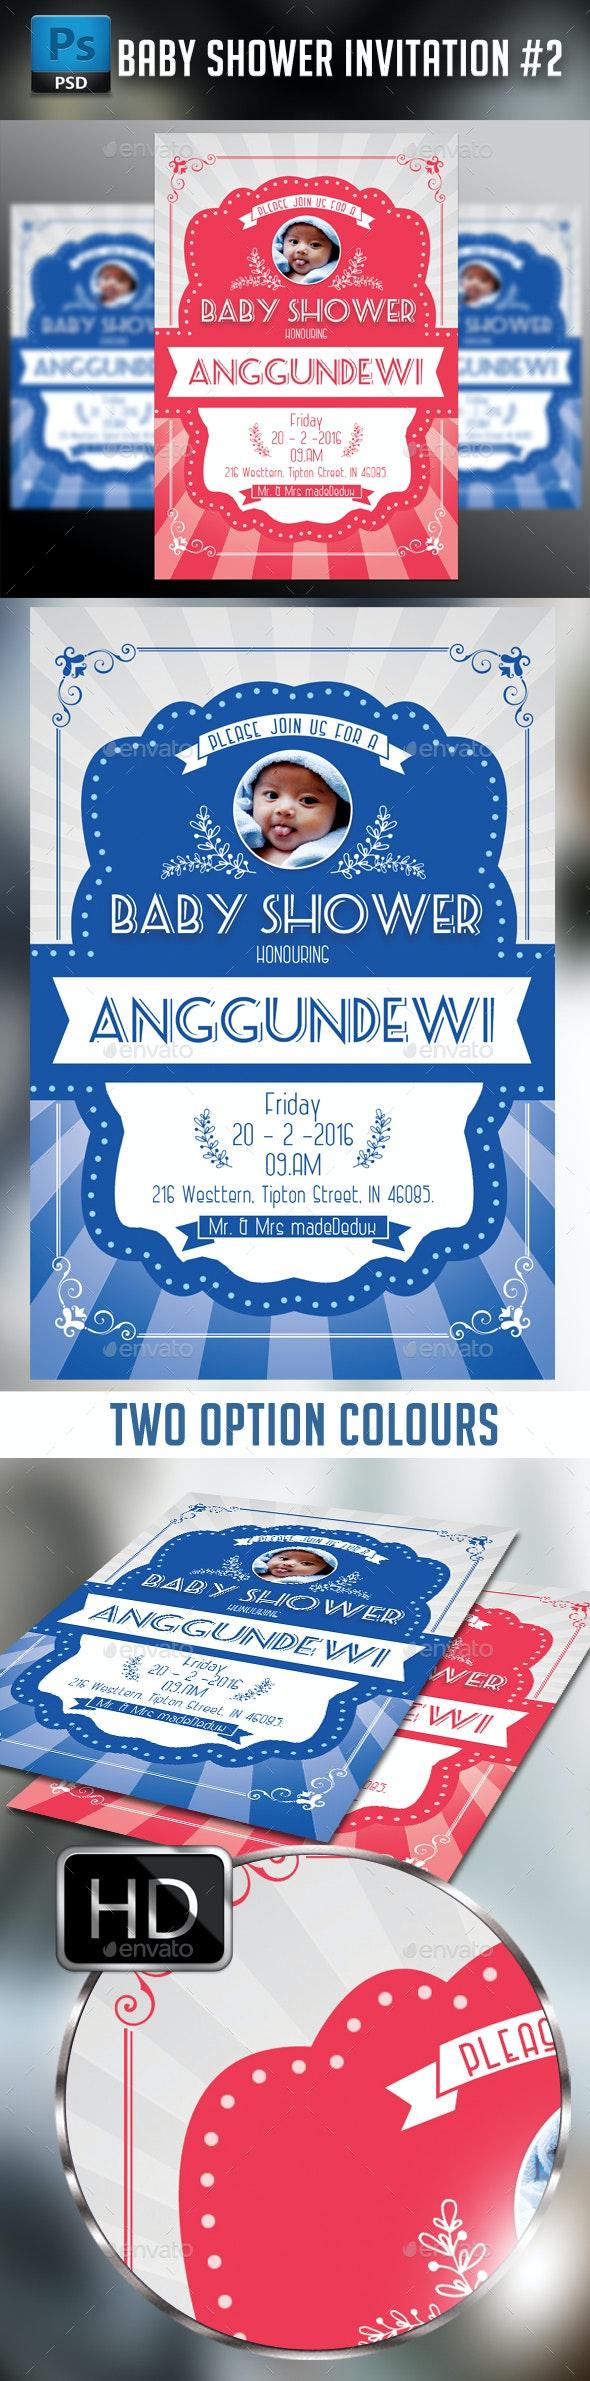 Baby Shower Invitation #2 - Cards & Invites Print Templates